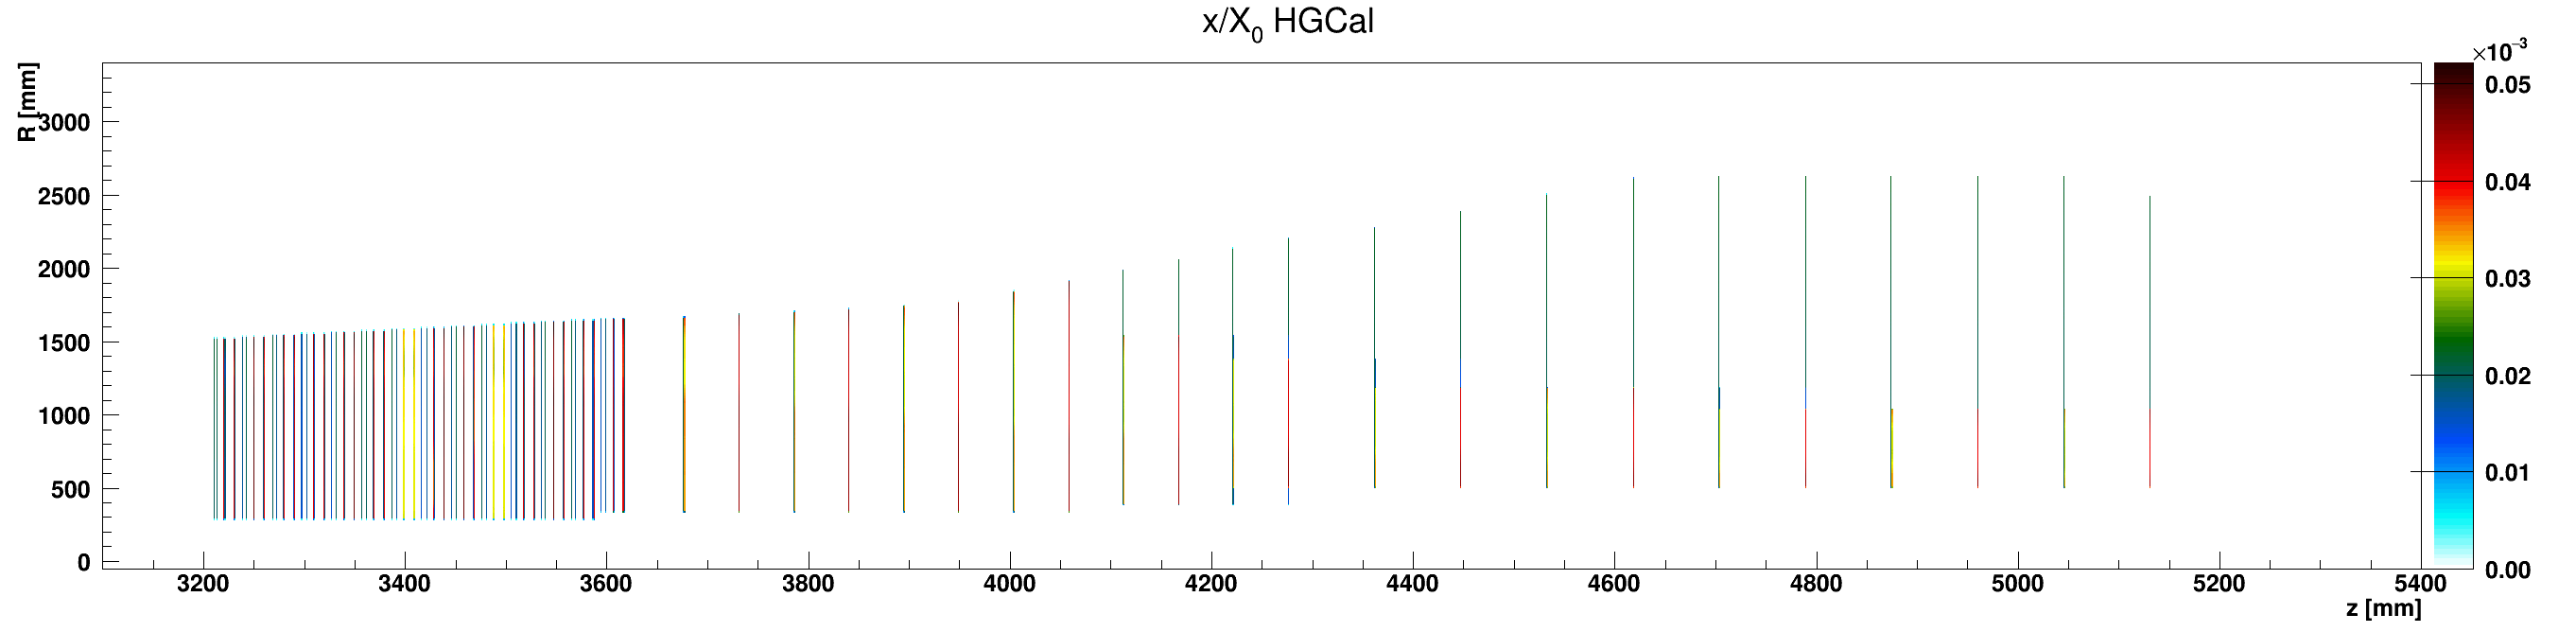 HGCal_x_vs_z_vs_RlocEpoxy_ZplusZoom.png